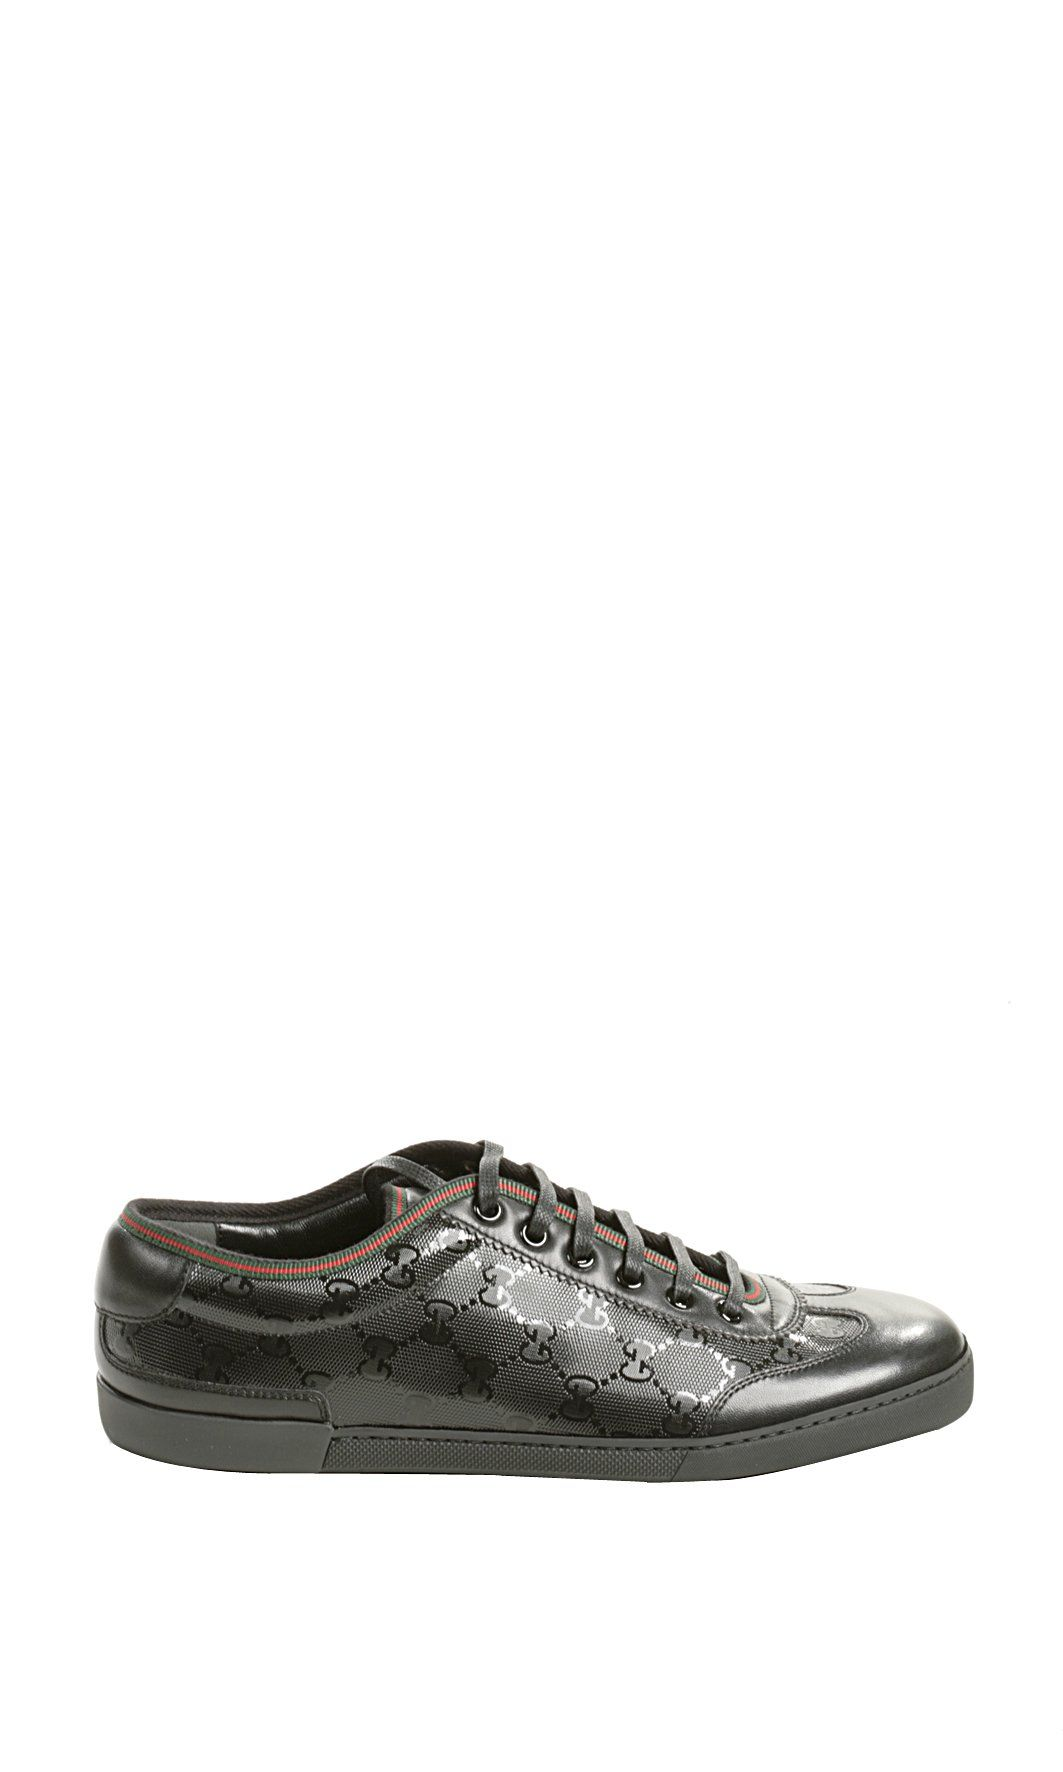 Gucci Barcelona Tennis Sneaker in Black for Men. Chaussures Pour Hommes,  Chaussures De Tennis 6f77ce75f40